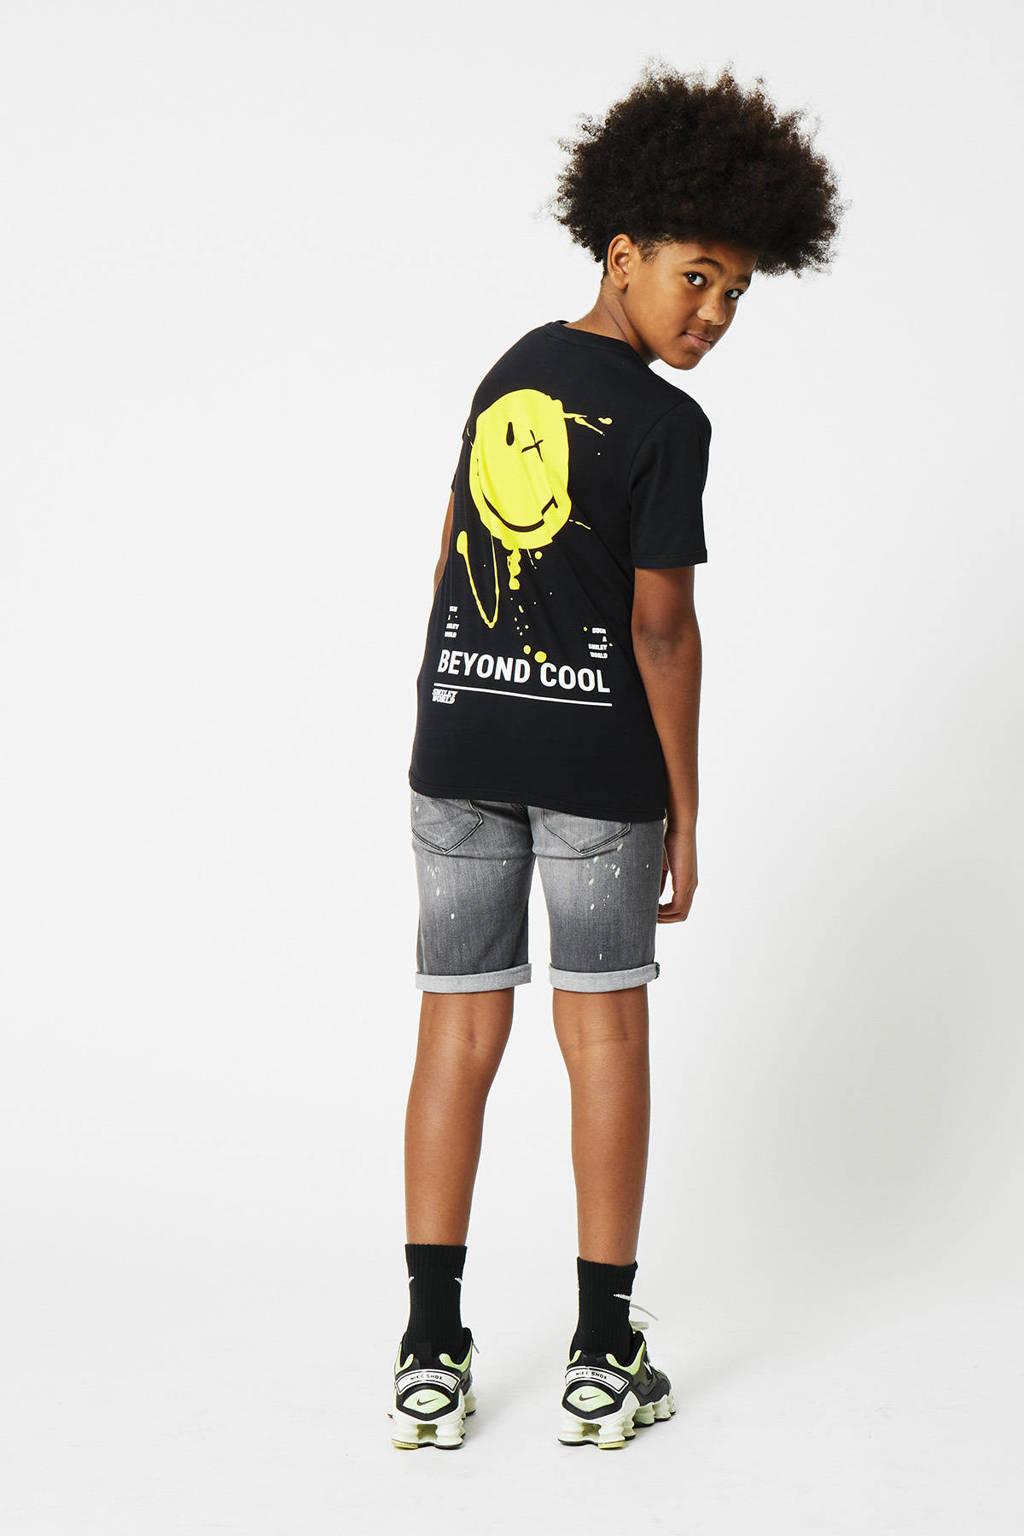 CoolCat Junior T-shirt Emilio coolcat x smiley world zwart/wit/geel, Zwart/wit/geel